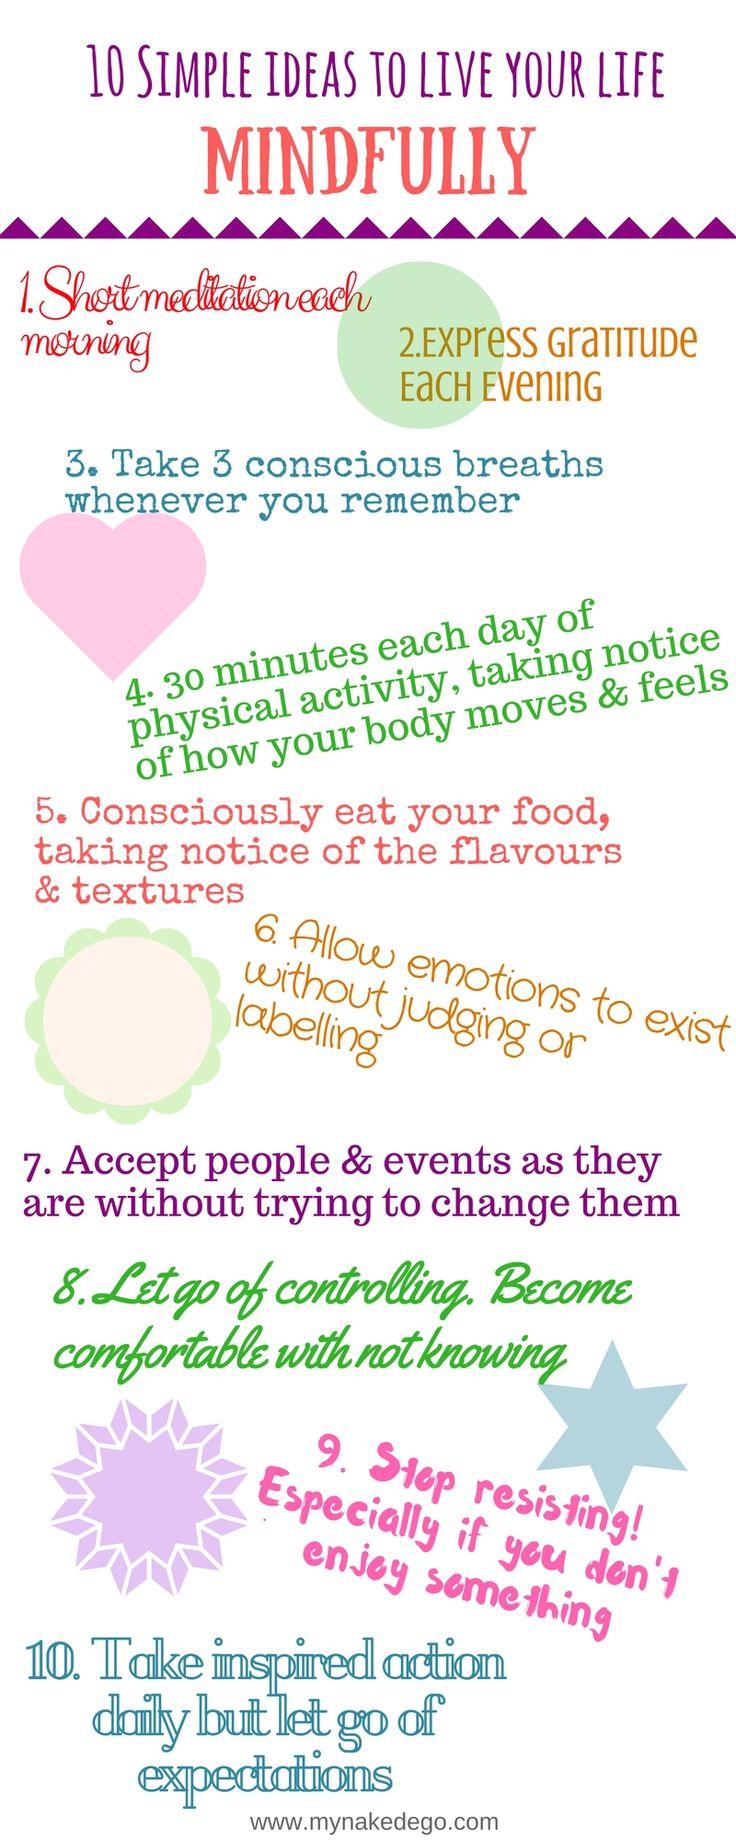 Simple ways to live mindfully - mindful living - mindfulness - spirituality - gratitude - meditation